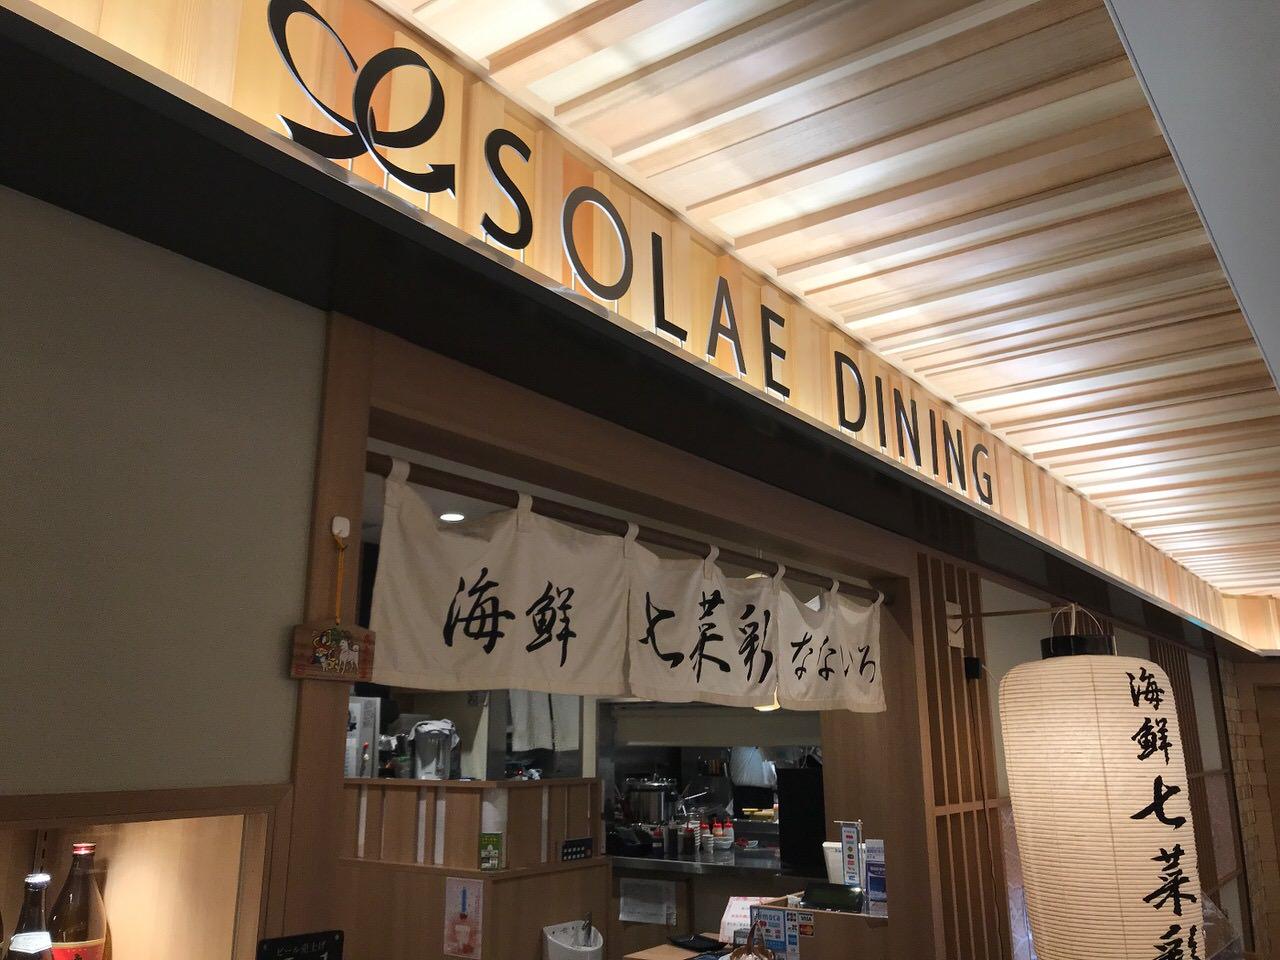 Solae dinning 13312